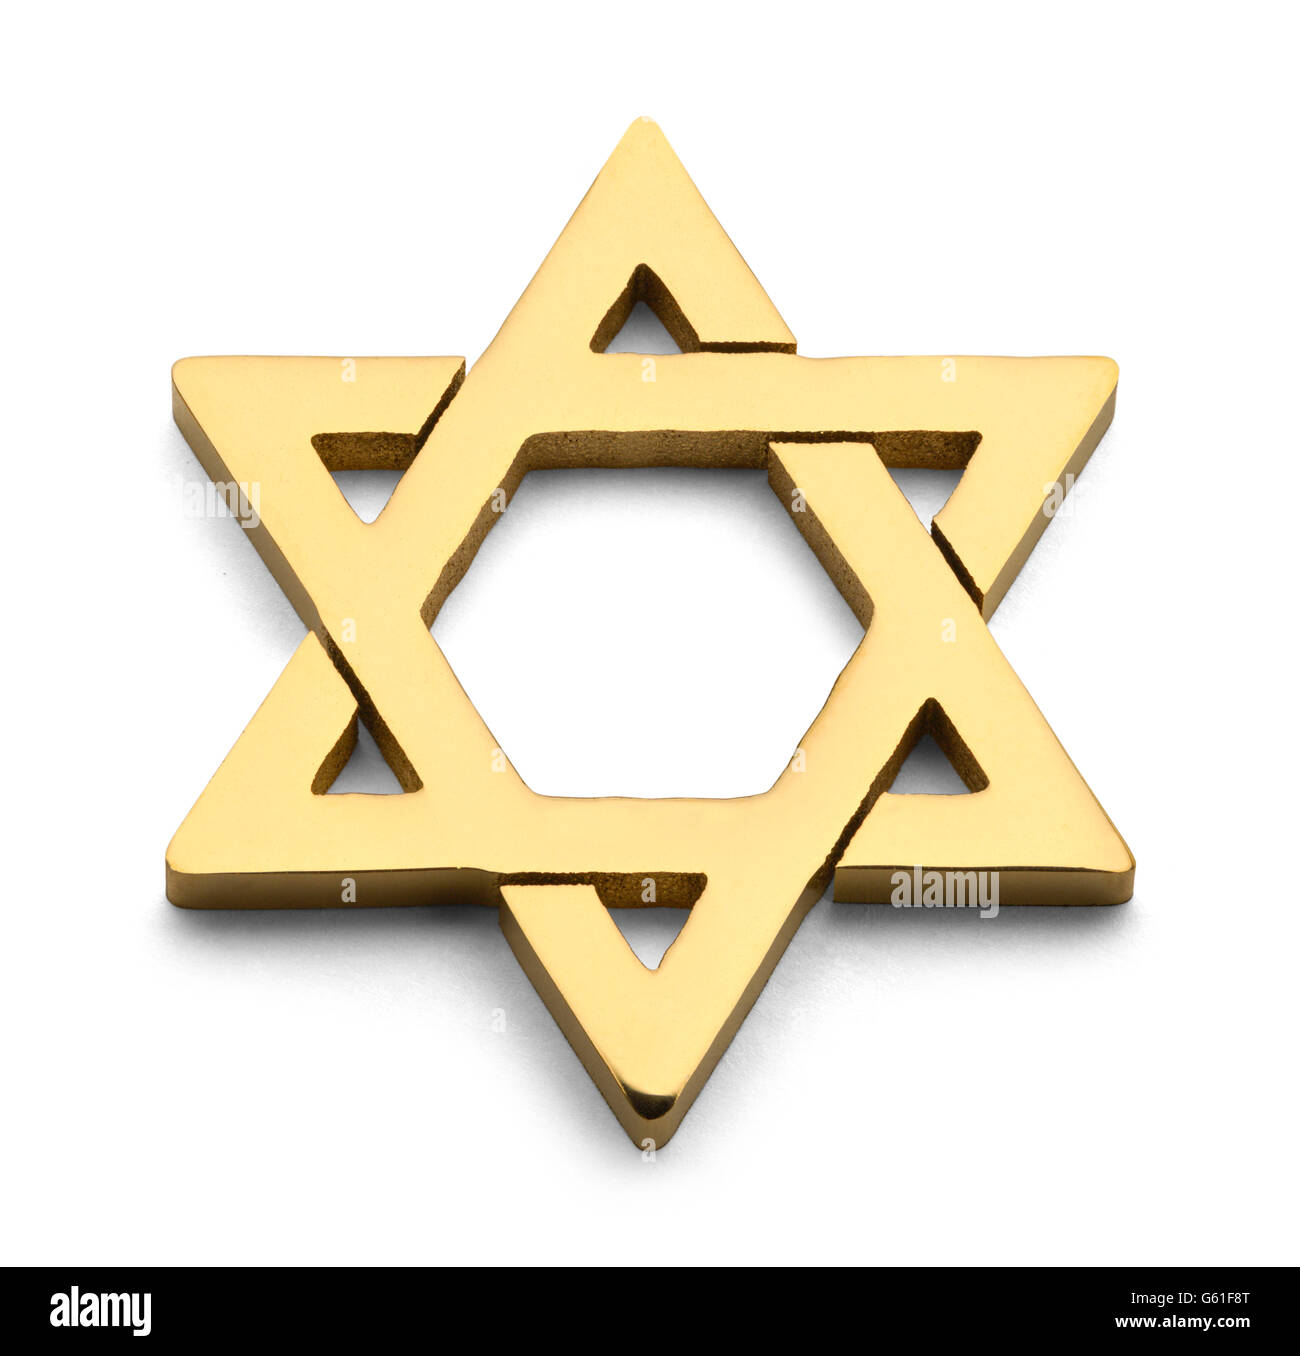 Jewish Golden Star of David Isolated on White Background. - Stock Image